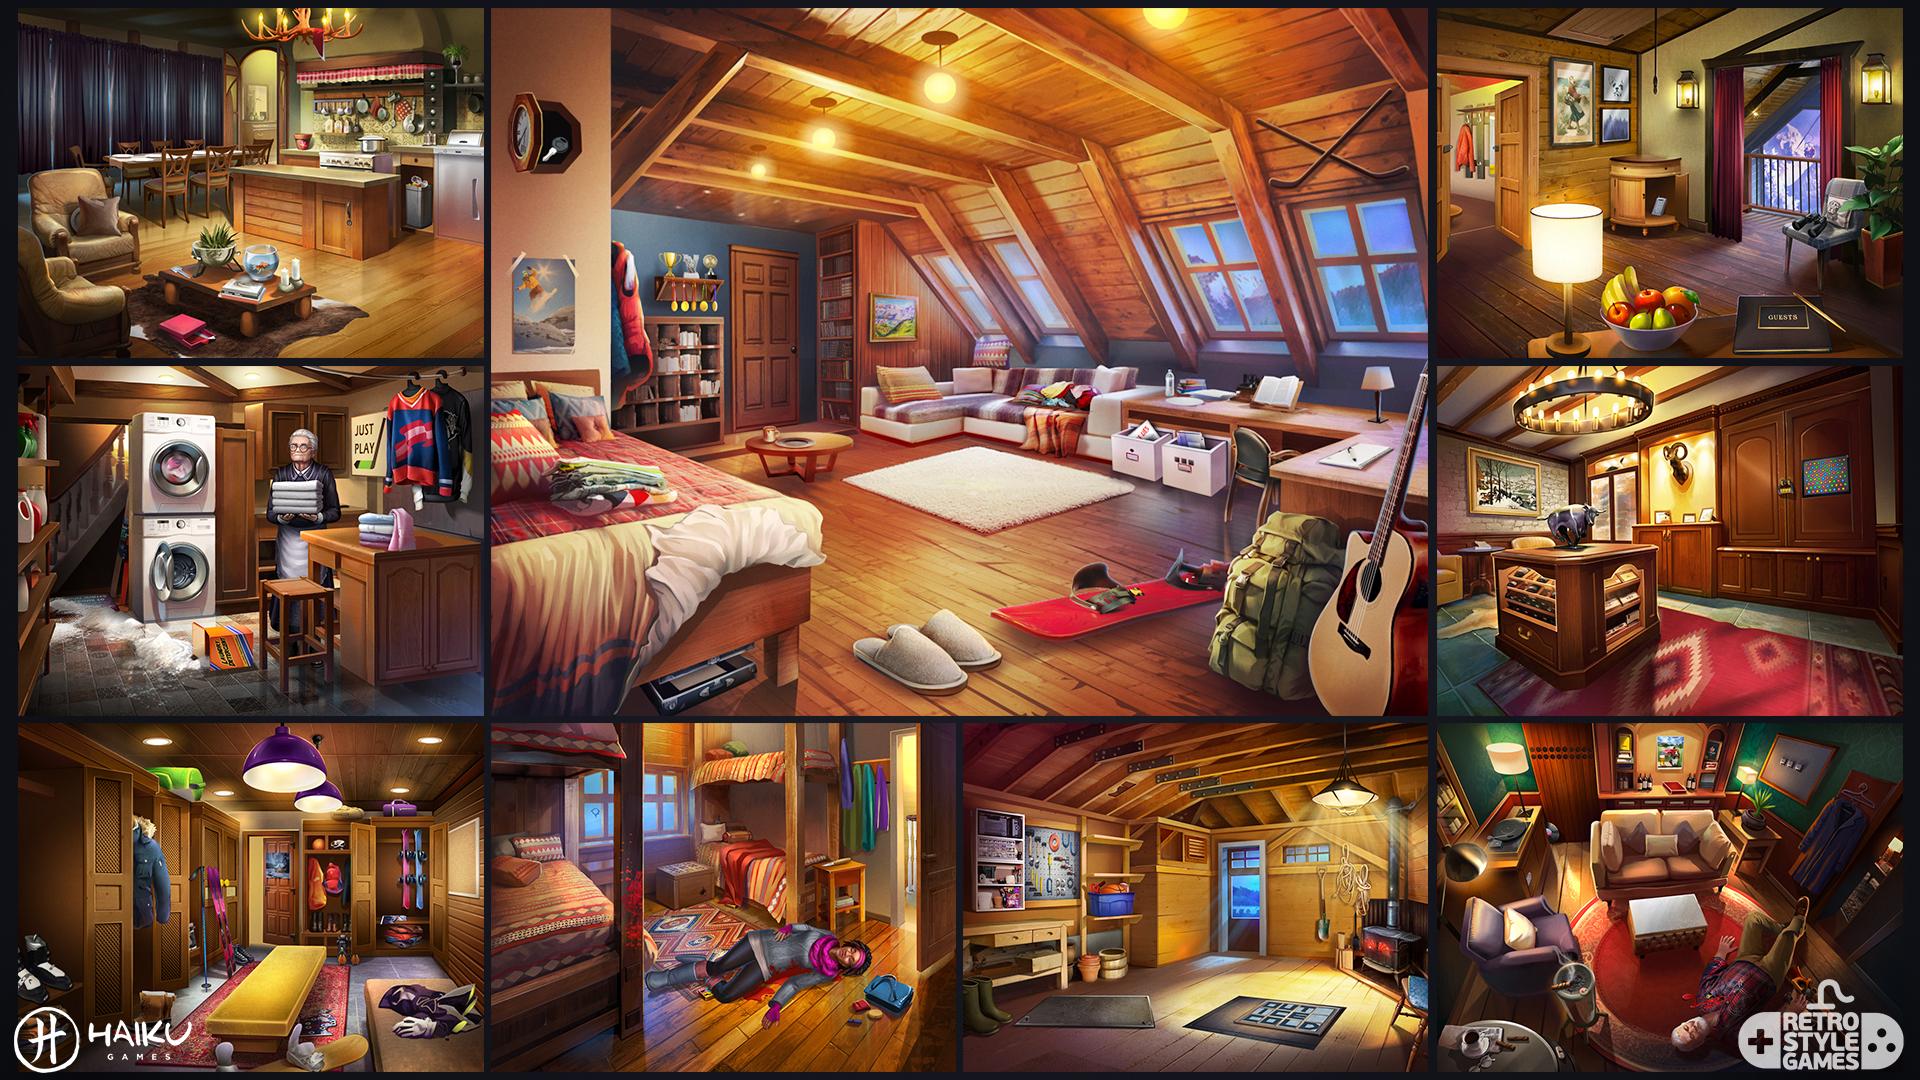 HAIKU Adventure Escape Murder Inn full art sheet1